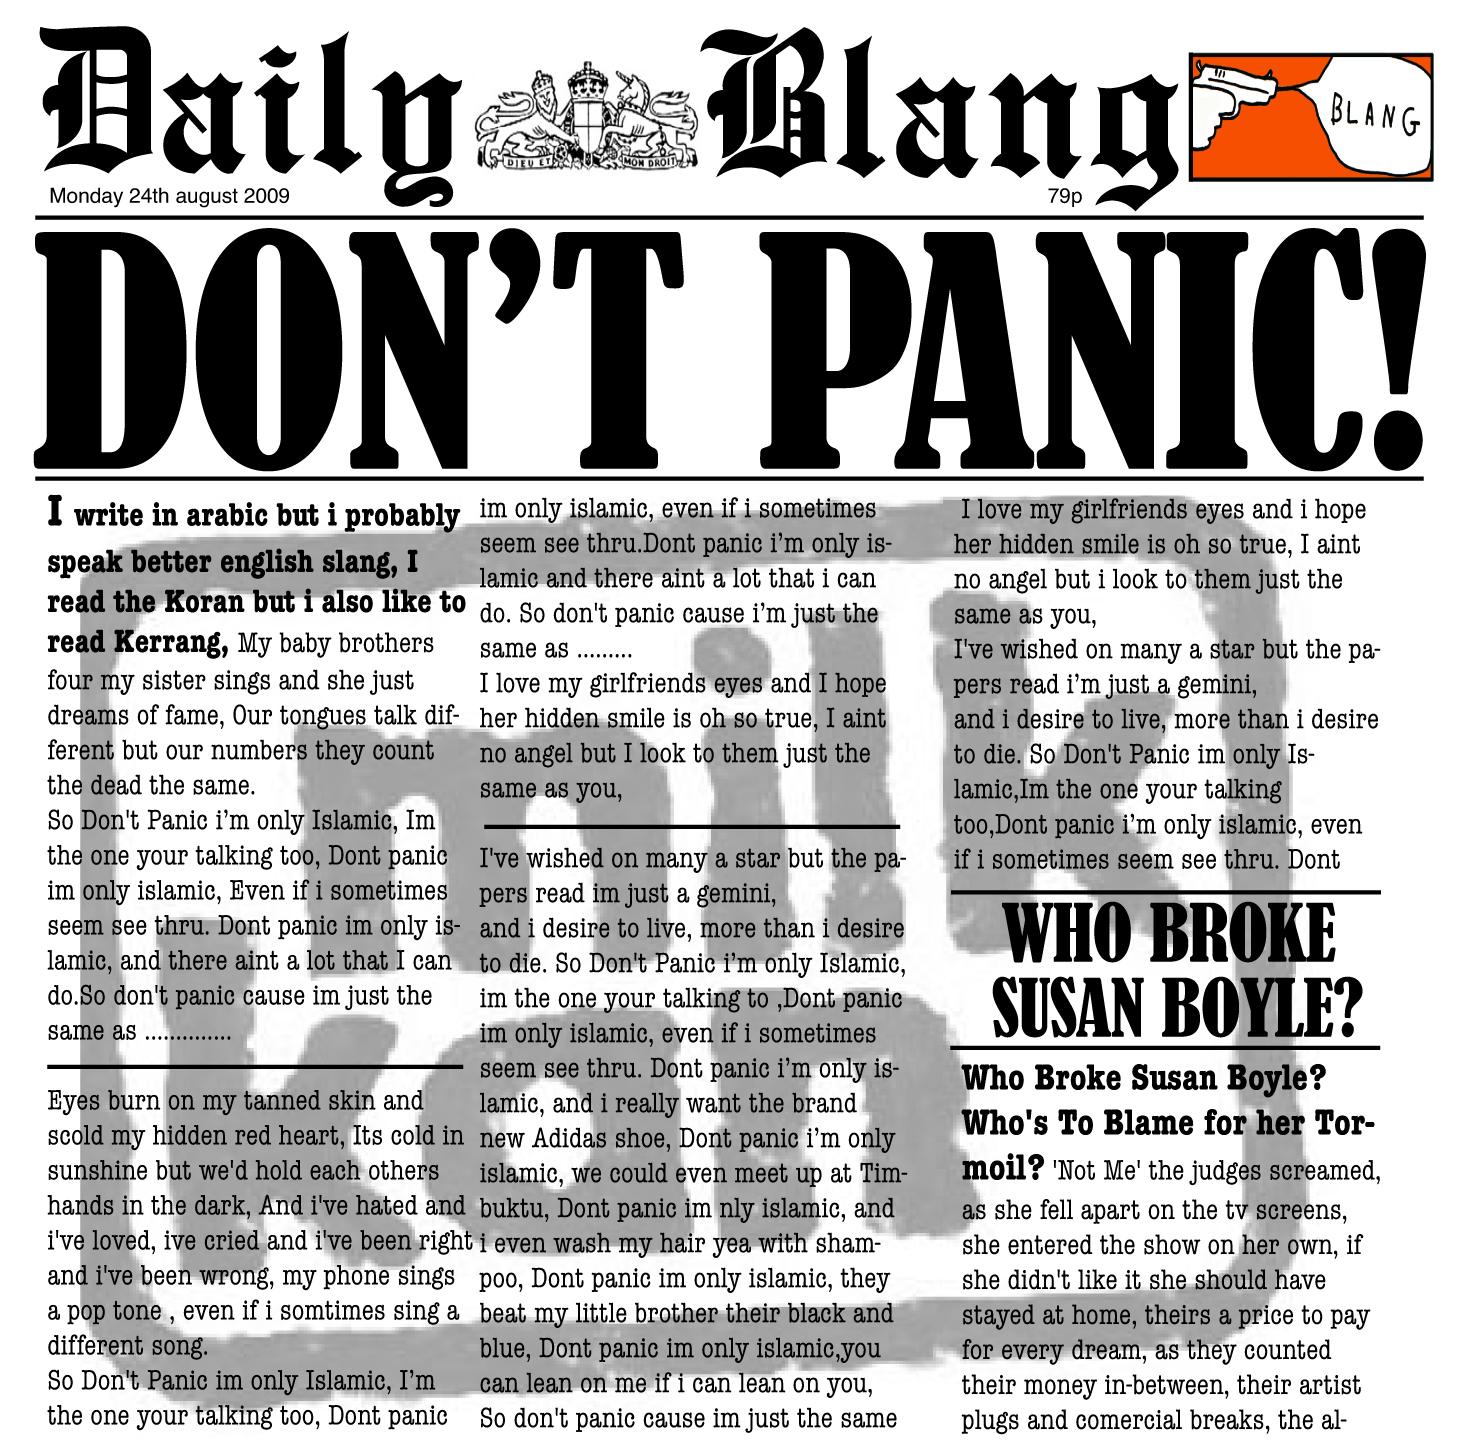 Milk Kan - Don't Panic download single (August 2009)